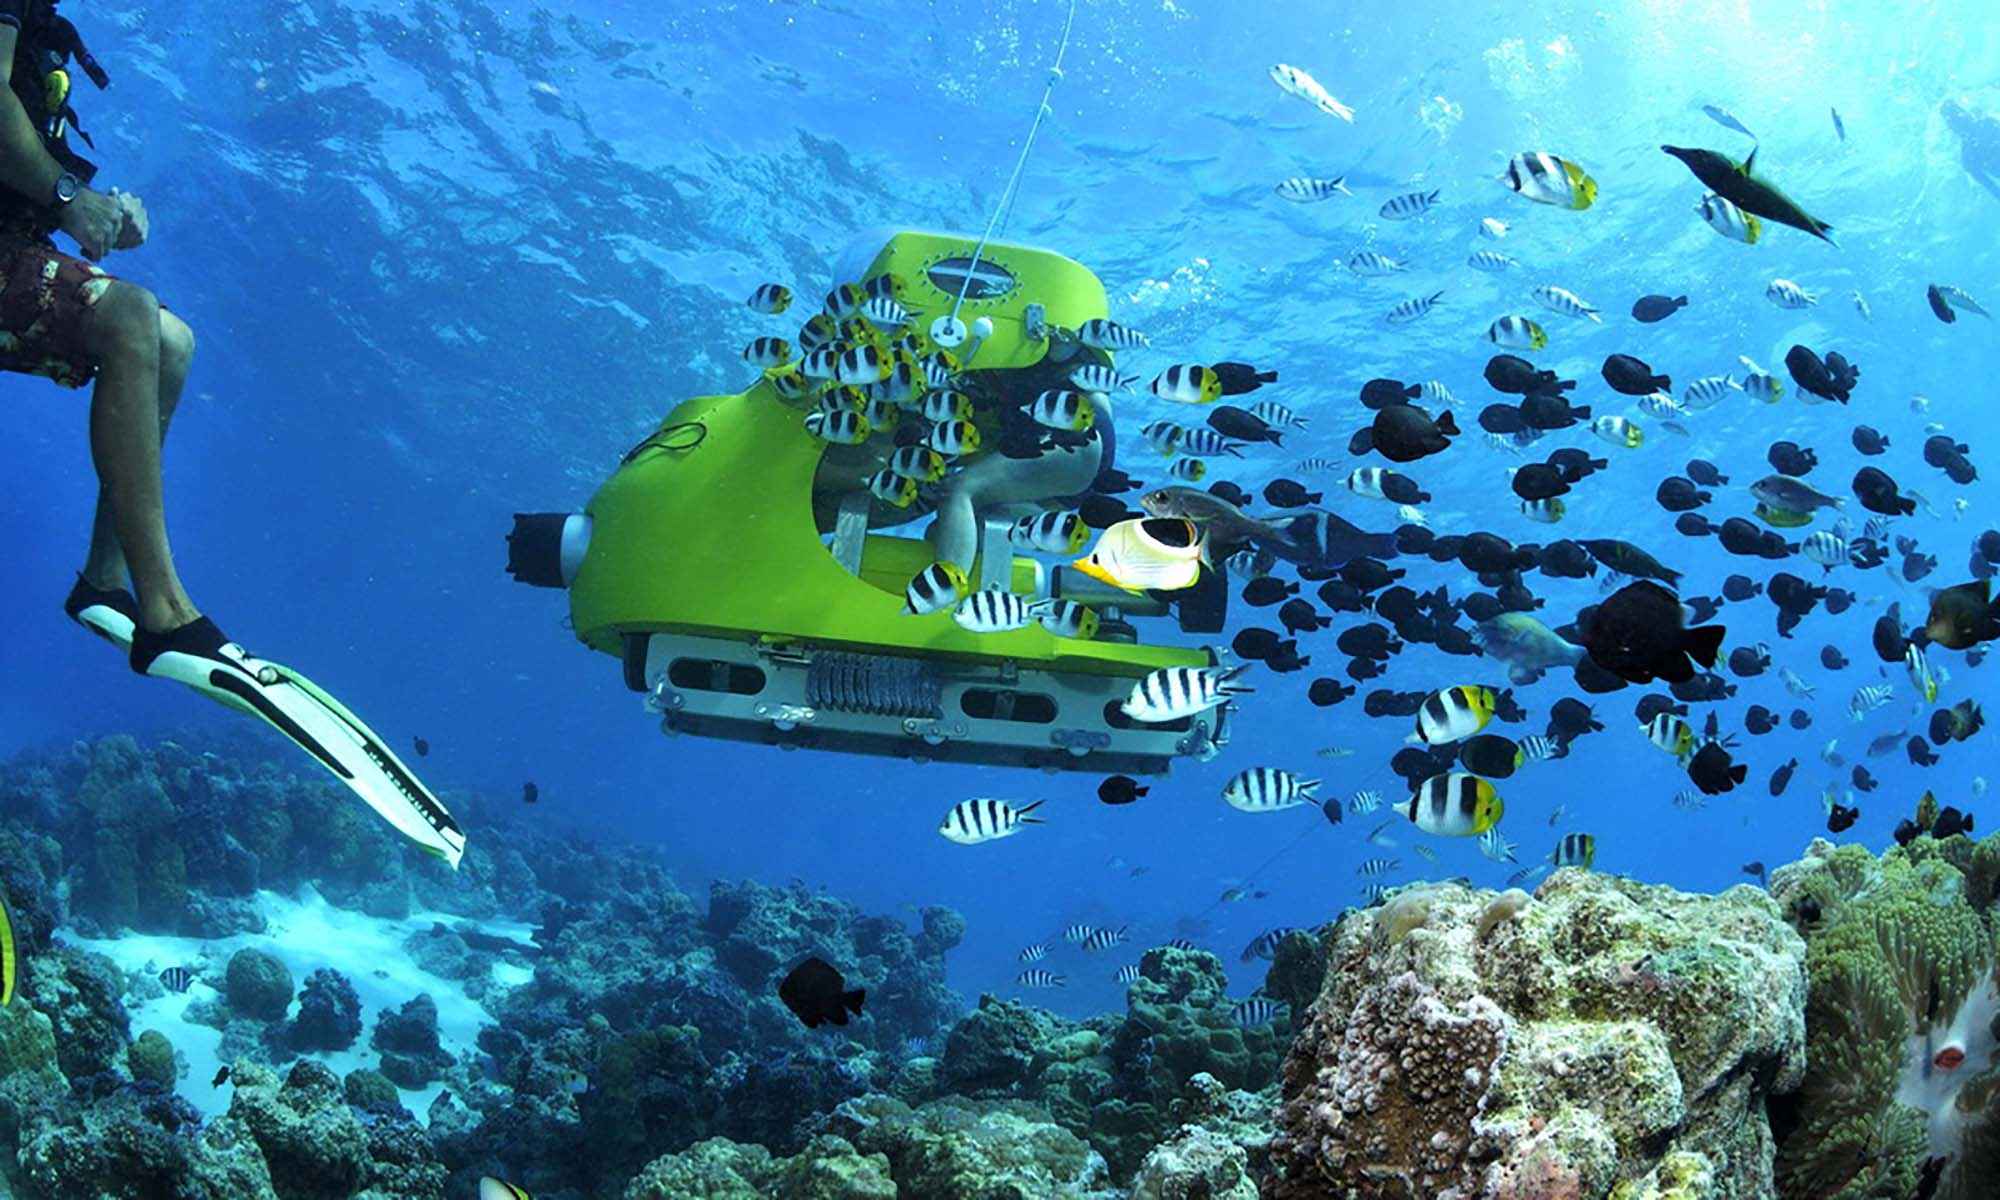 Bora Bora Underwater Scooter | Tahiti.com